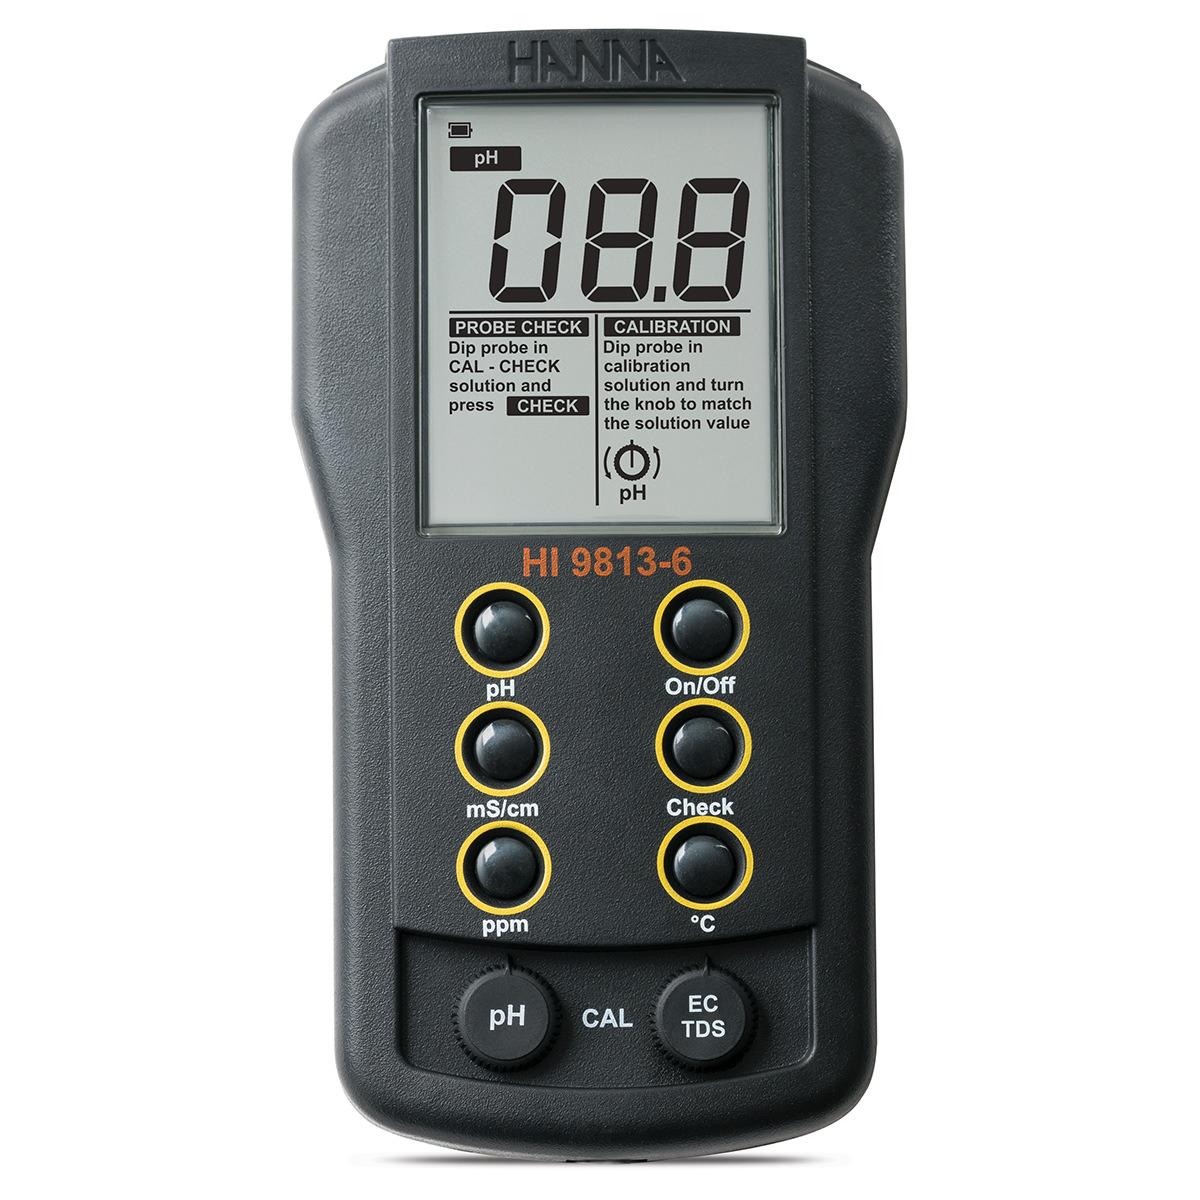 Portable pH/EC/TDS/Temperature Meter with CAL Check™ - HI9813-6